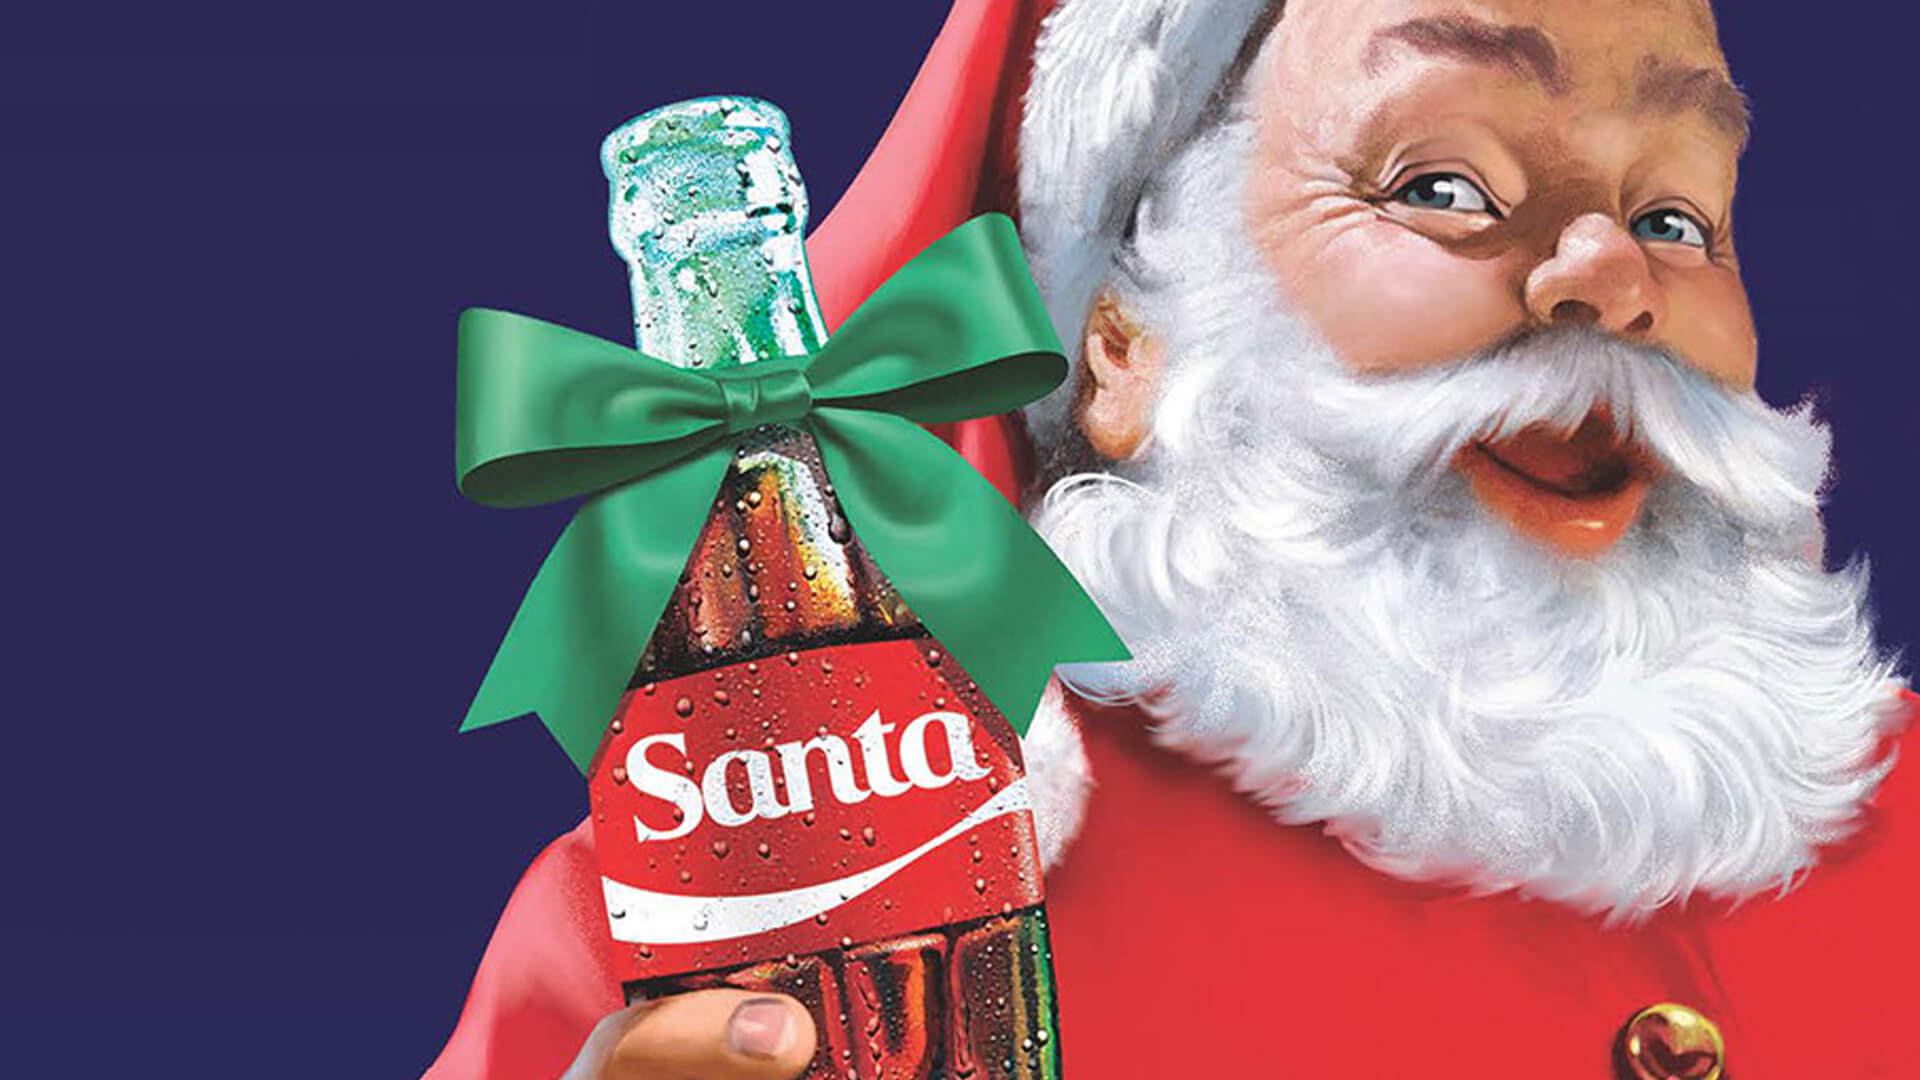 The Brand Storytelling Genius Of The Coca-cola Santa photo